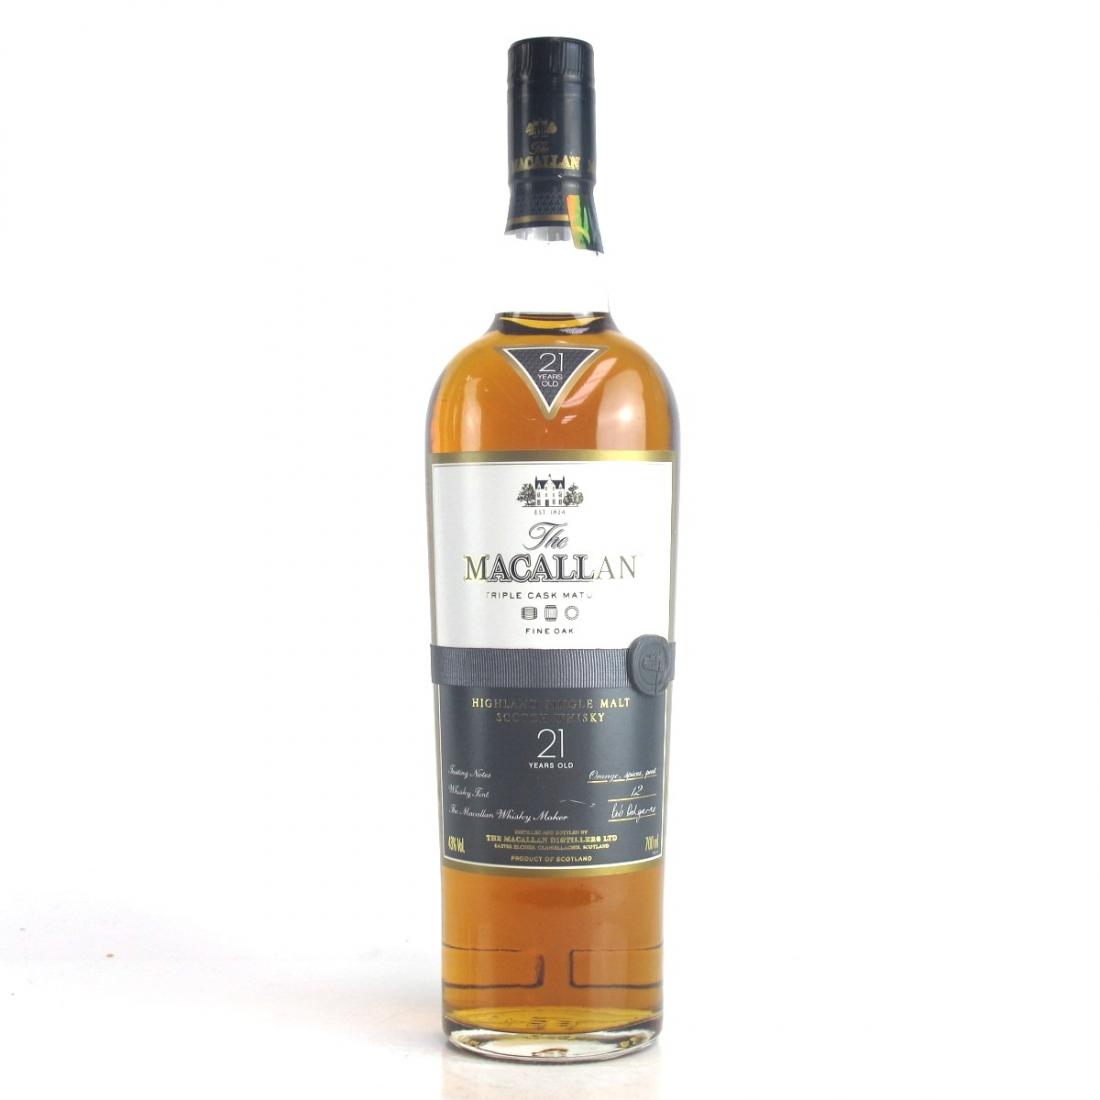 Macallan 21 Year Old Fine Oak